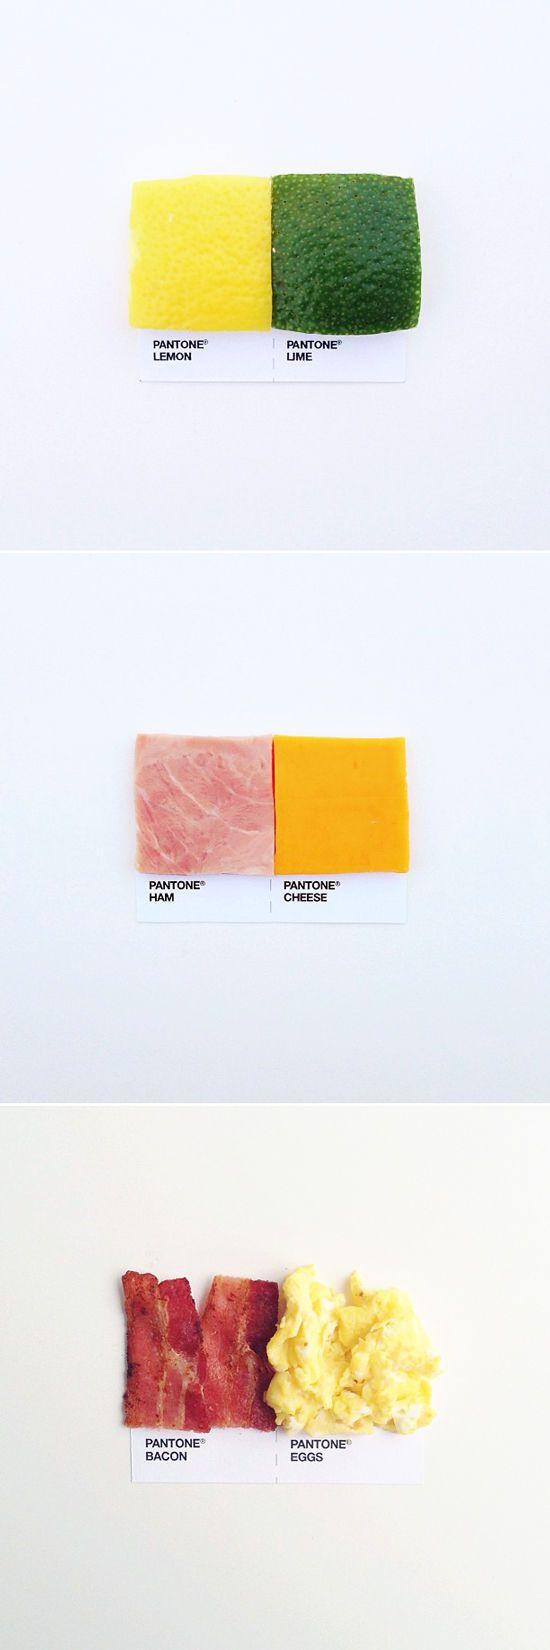 pantone pairings: lemon & lime, ham & cheese, bacon & eggs